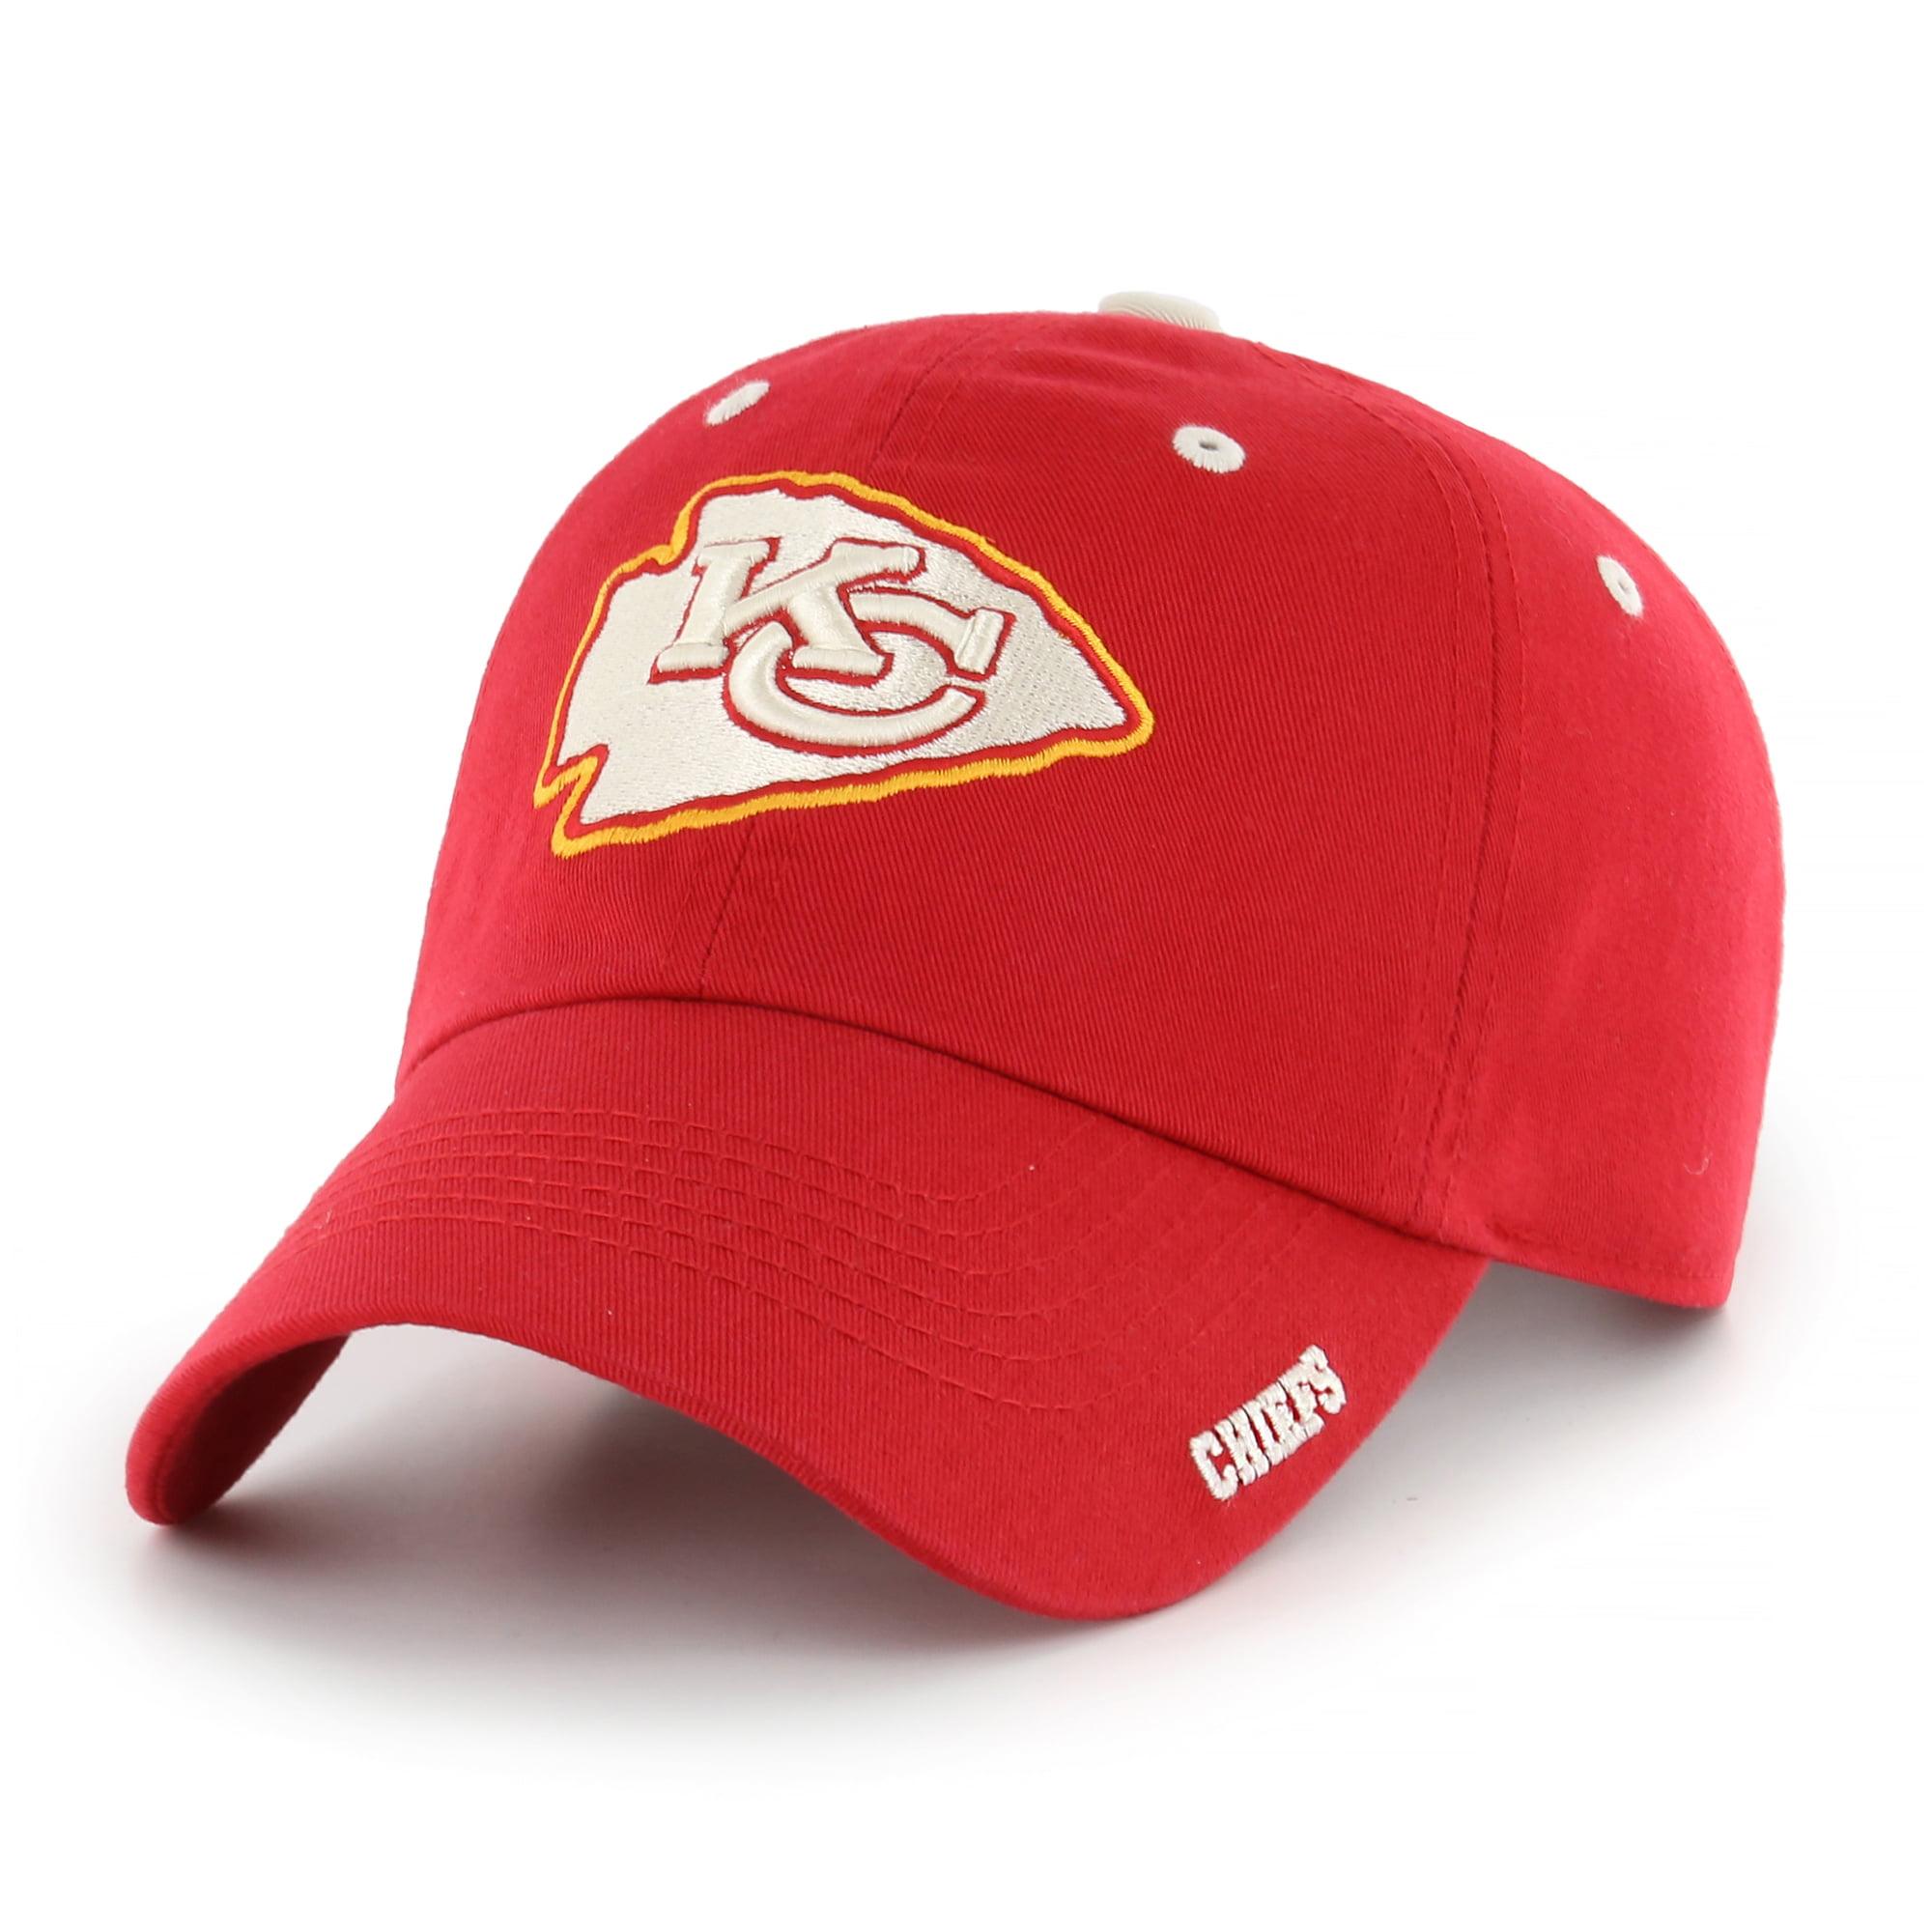 NFL Kansas City Chiefs Ice Adjustable Cap/Hat by Fan Favorite